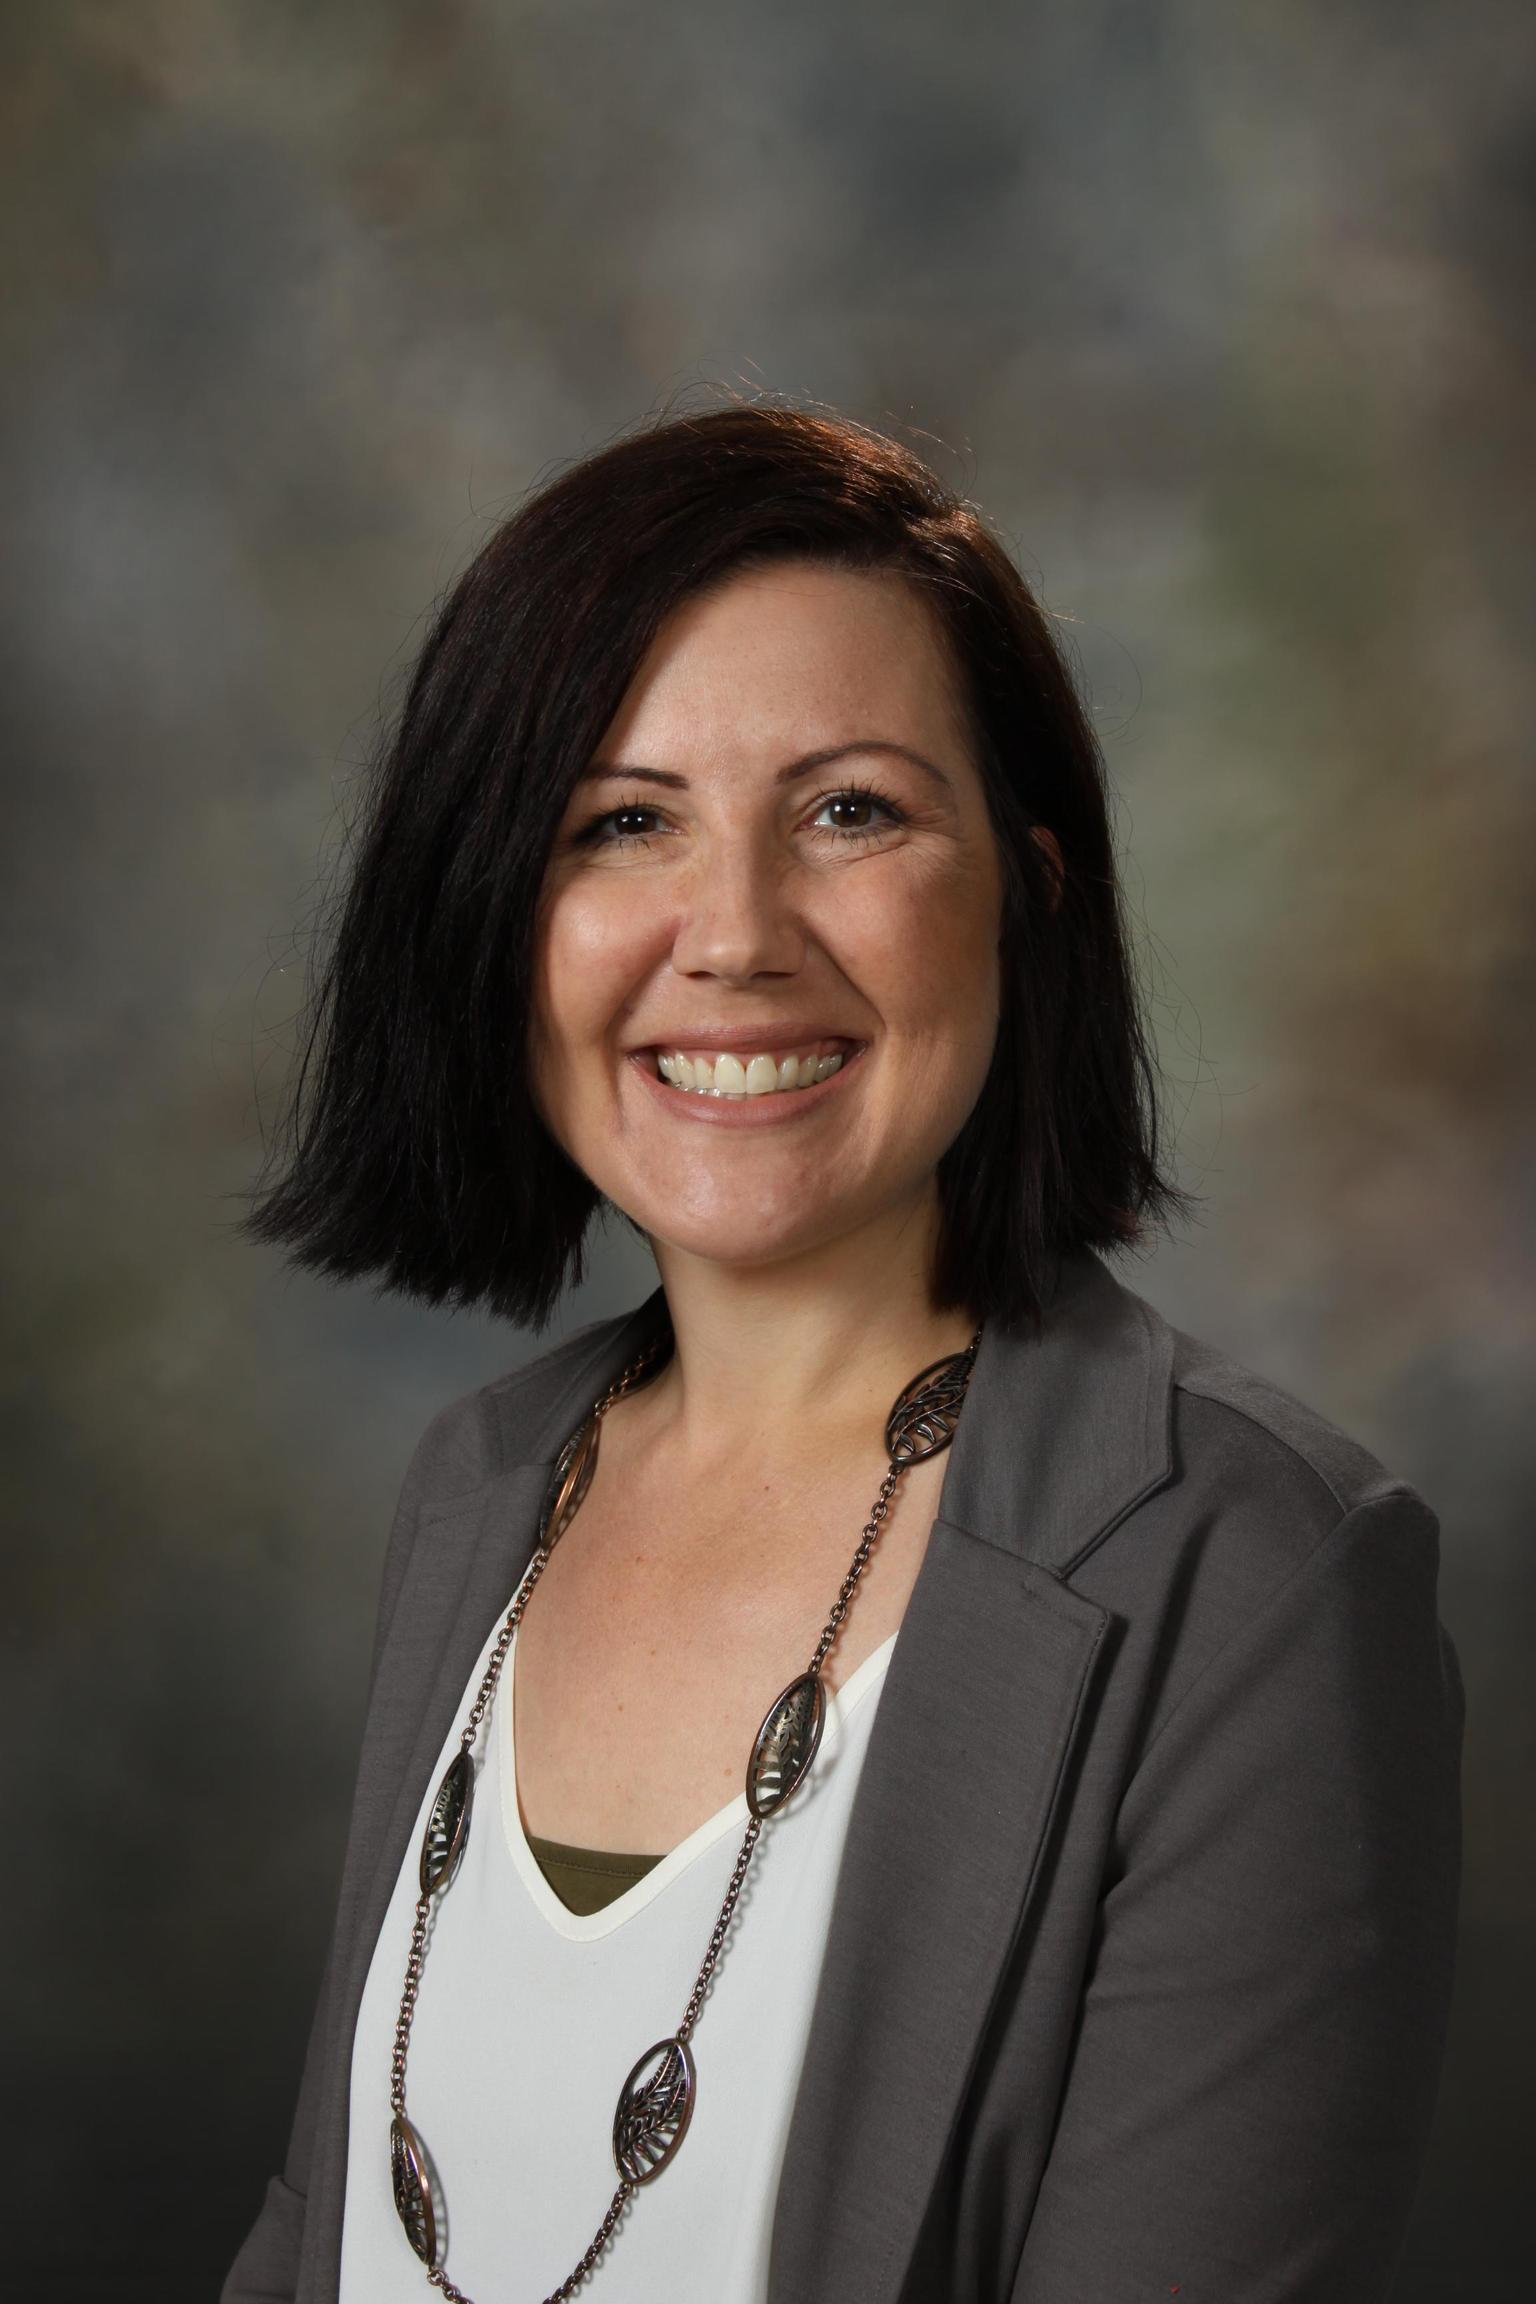 Dr. Larissa Westerfield